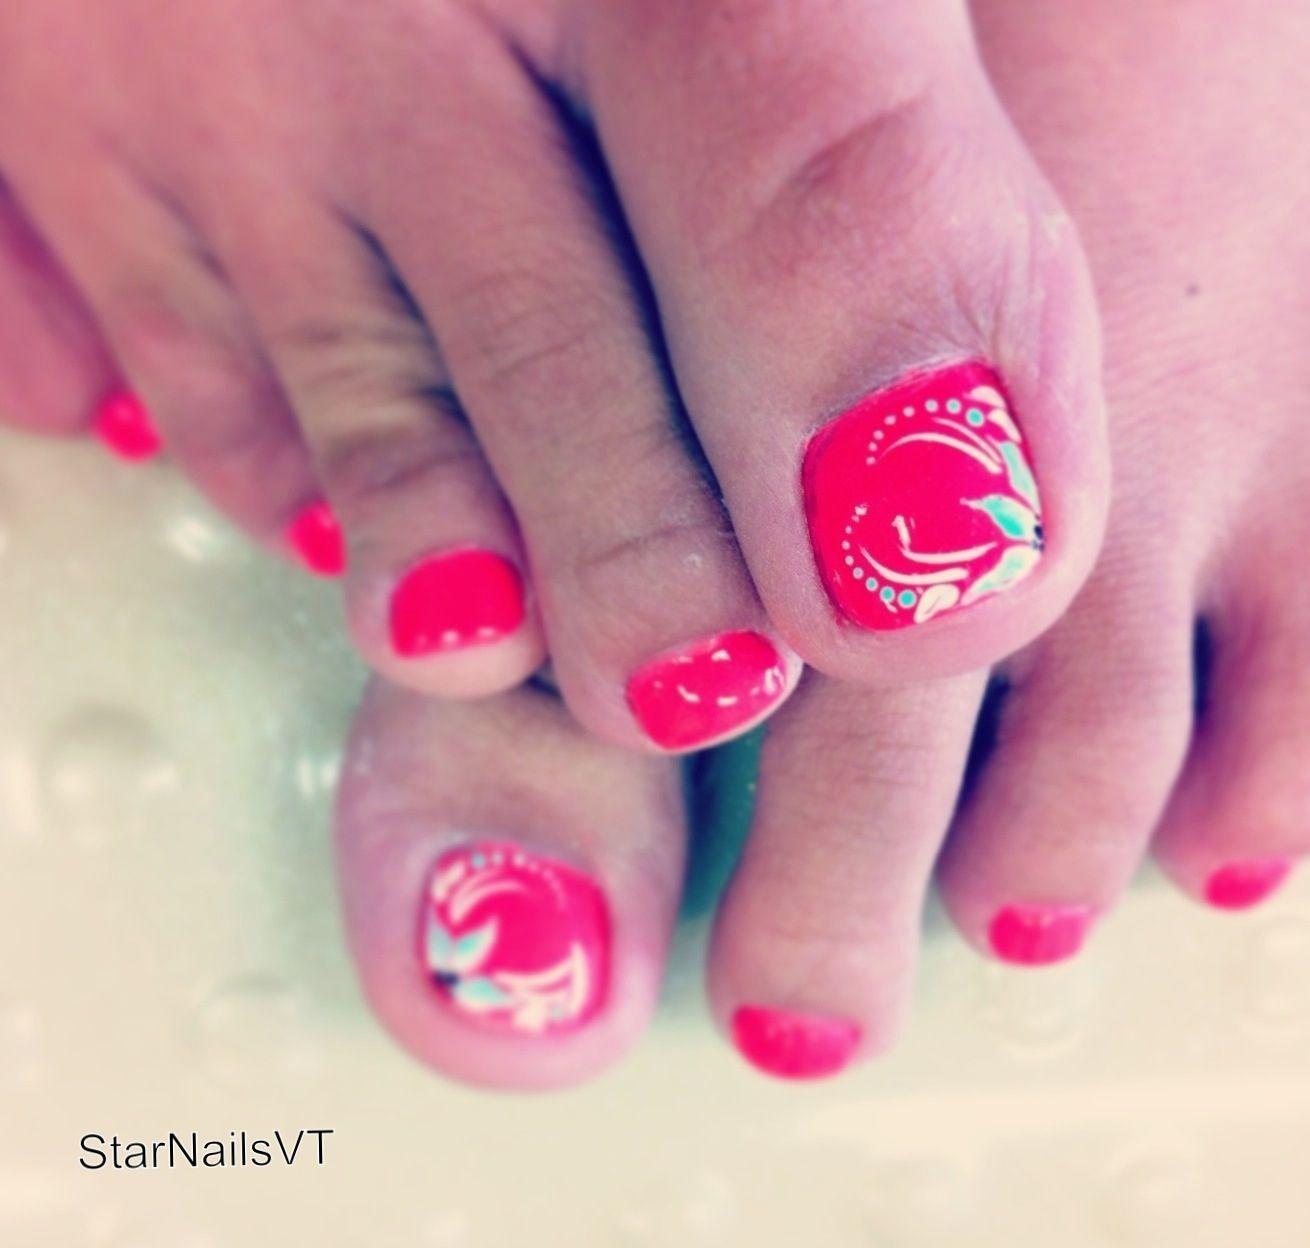 Toe Nail Designs Tumblr Cheetah Toe Nail Art Designs 2014